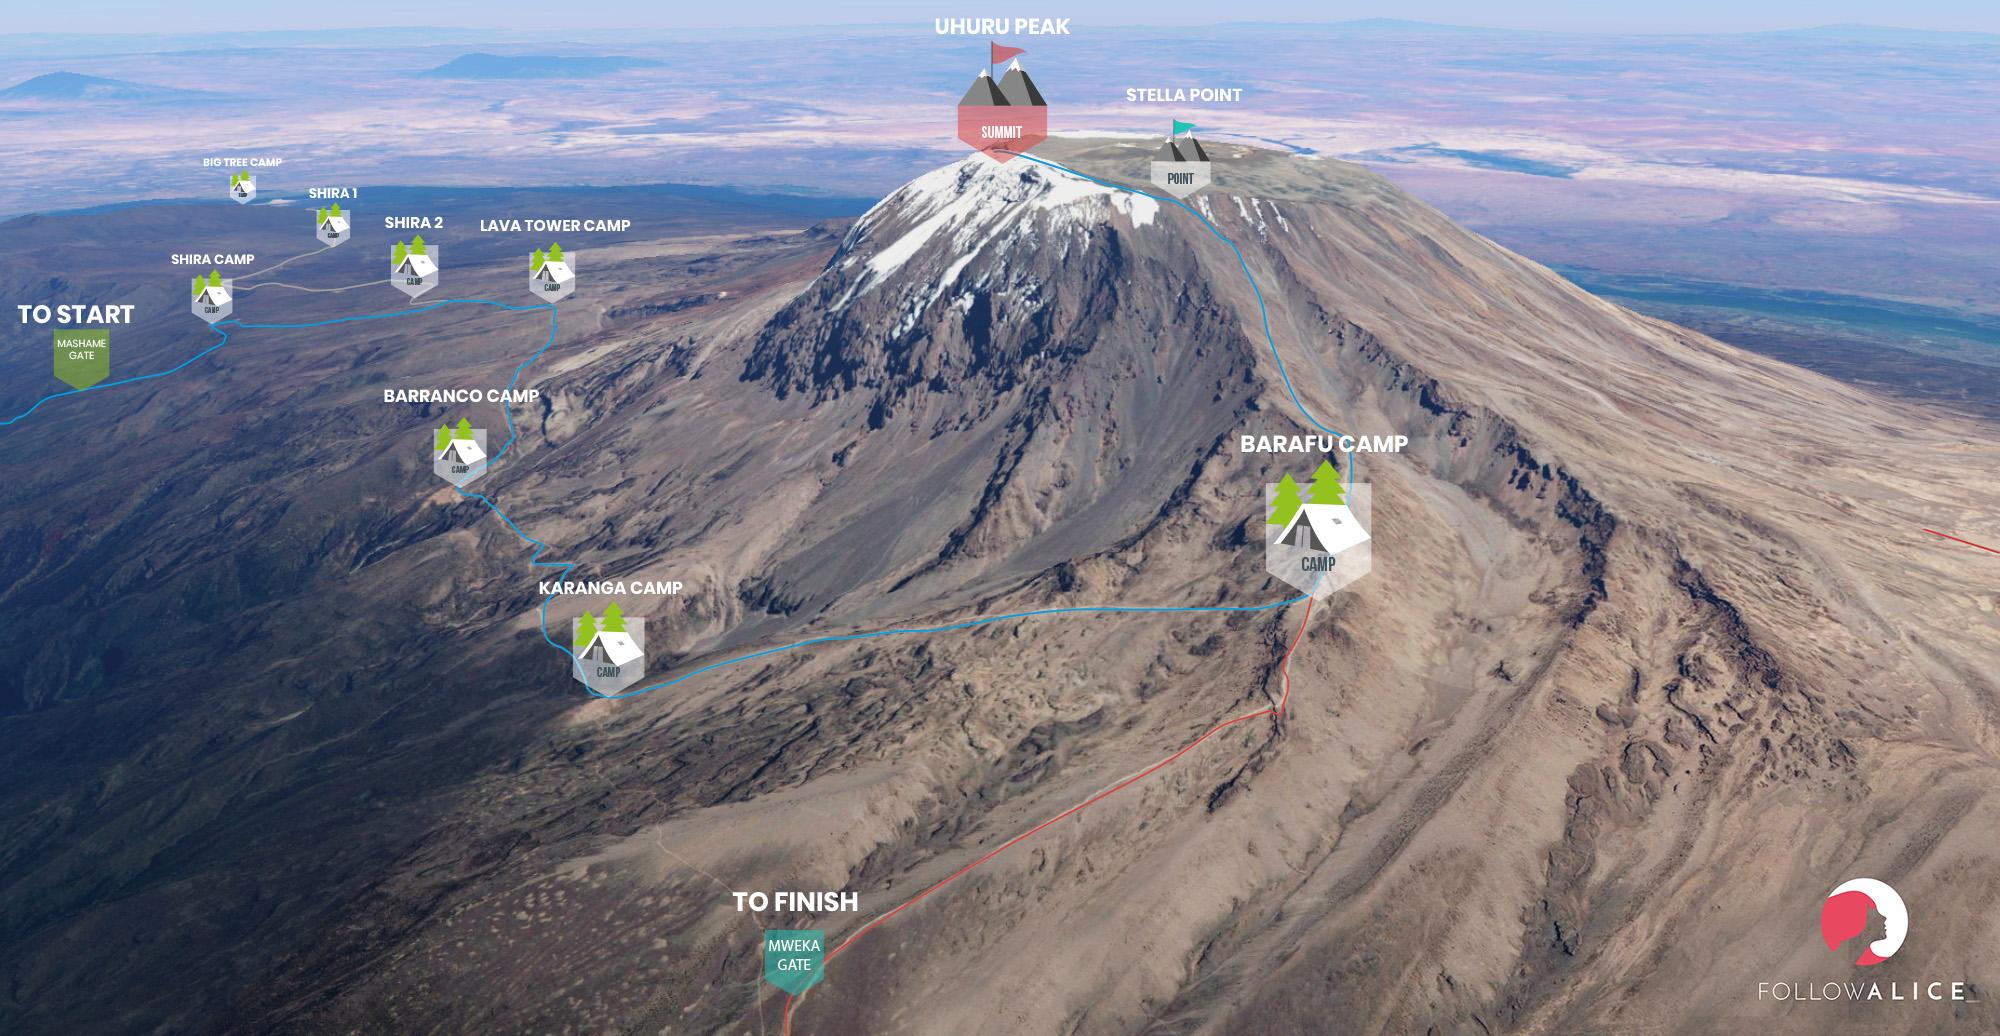 Kilimanjaro routes - Differences between Kilimanjaro ...